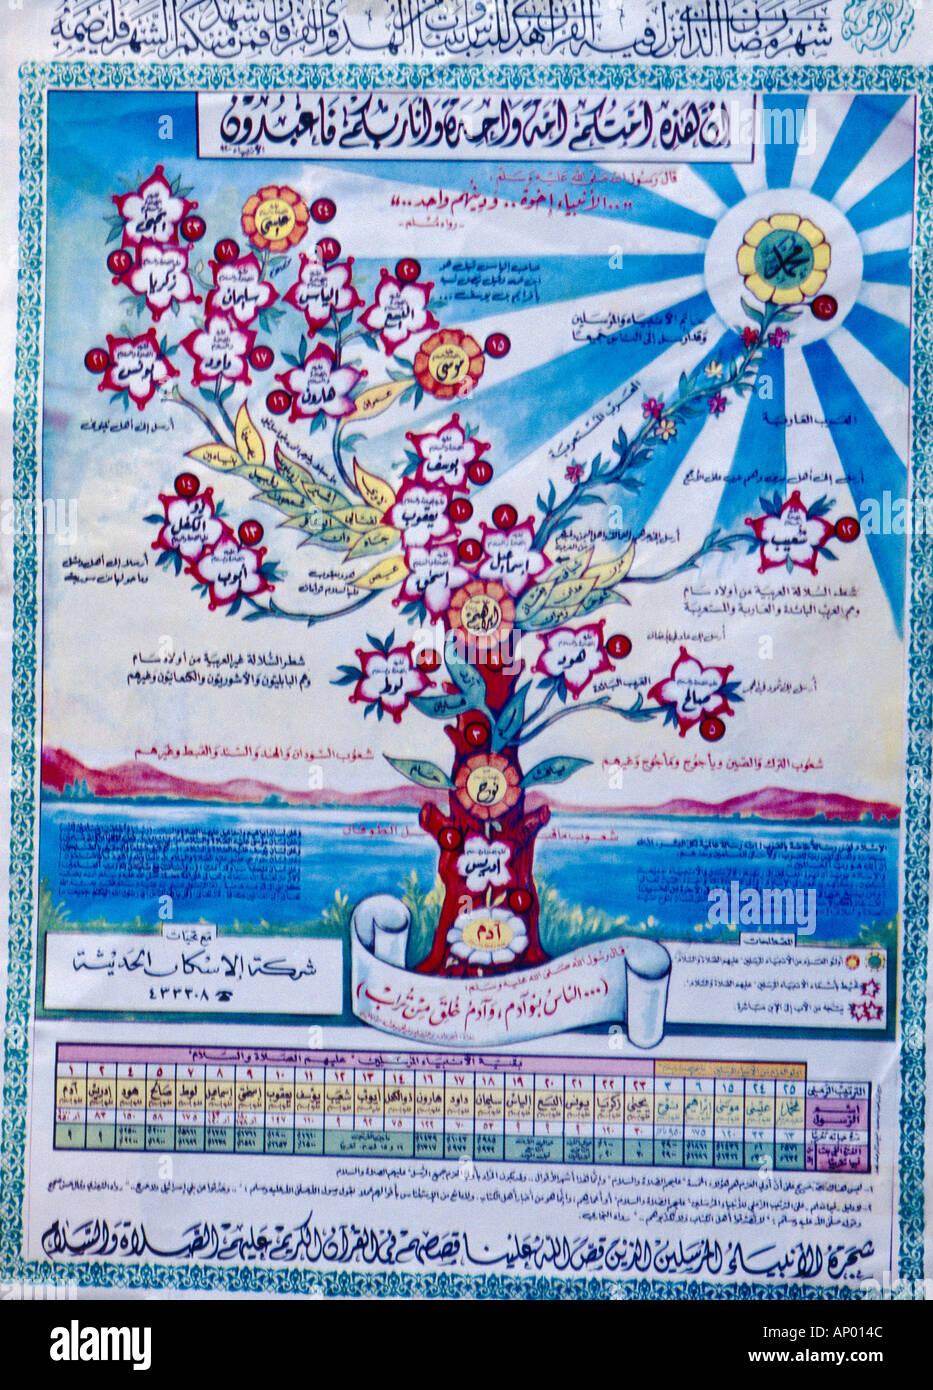 Mohammed Genealogy Tree Islamic Calendar - Stock Image